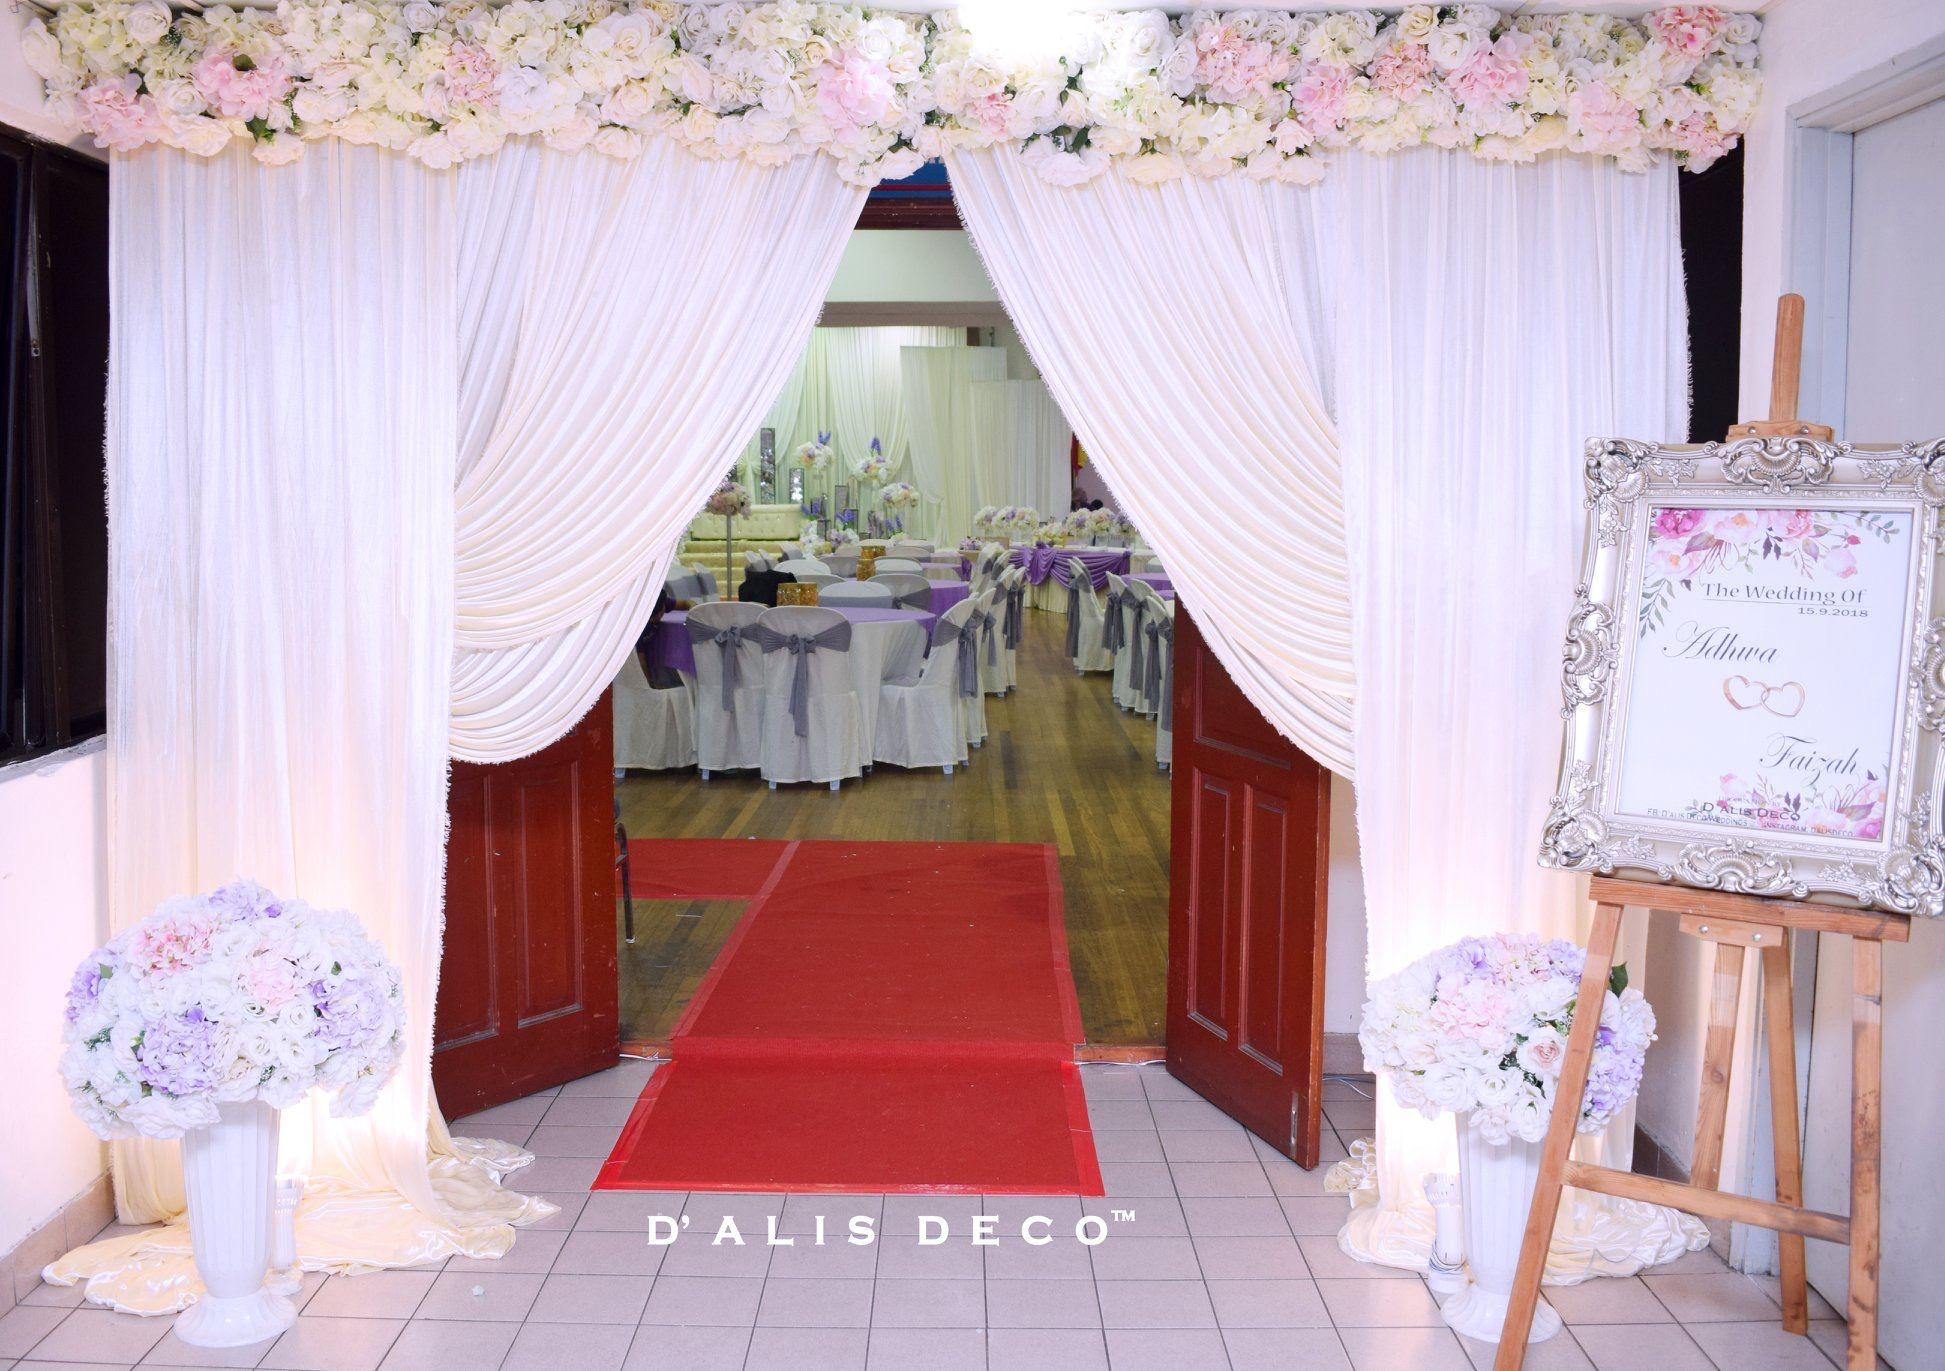 Fb D Alis Deco Weddings Insta Dalisdeco Photographer Camreman Pelamin Sanding Murah Dan Bajet Pelamin Be Wedding Deco Wedding Catering Wedding Trends